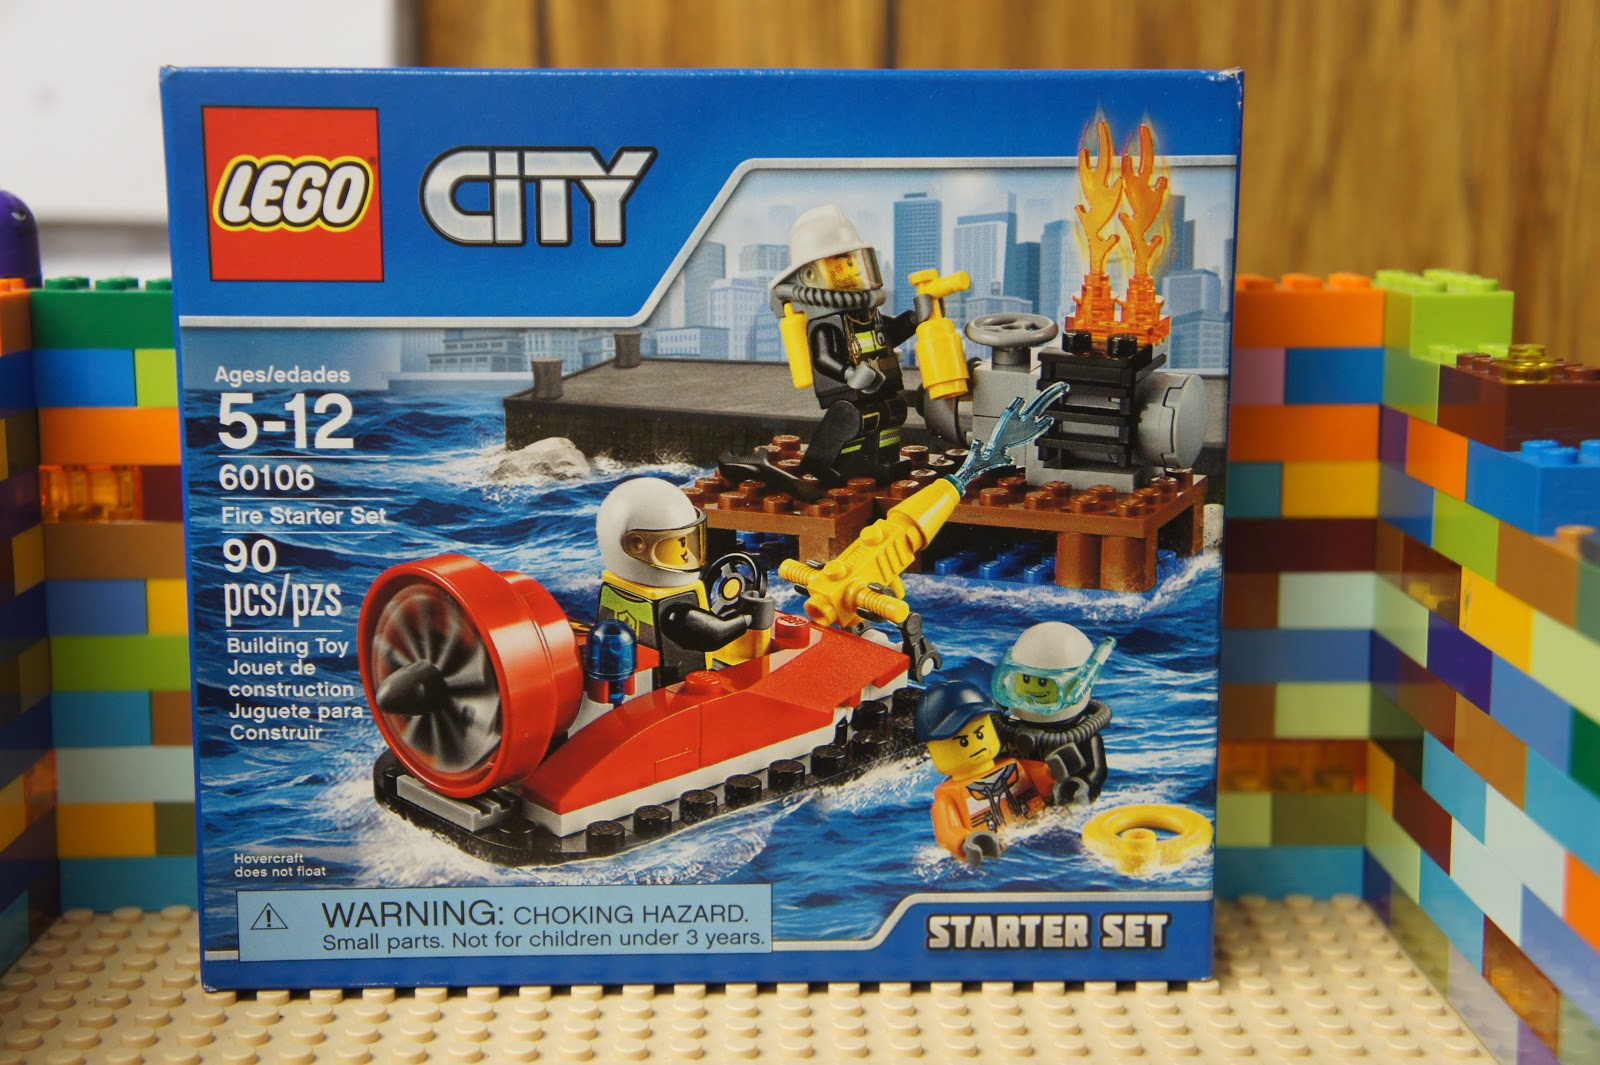 60106 FIRE STARTER SET lego city town NEW legos FIREMEN 4 minifigs boat